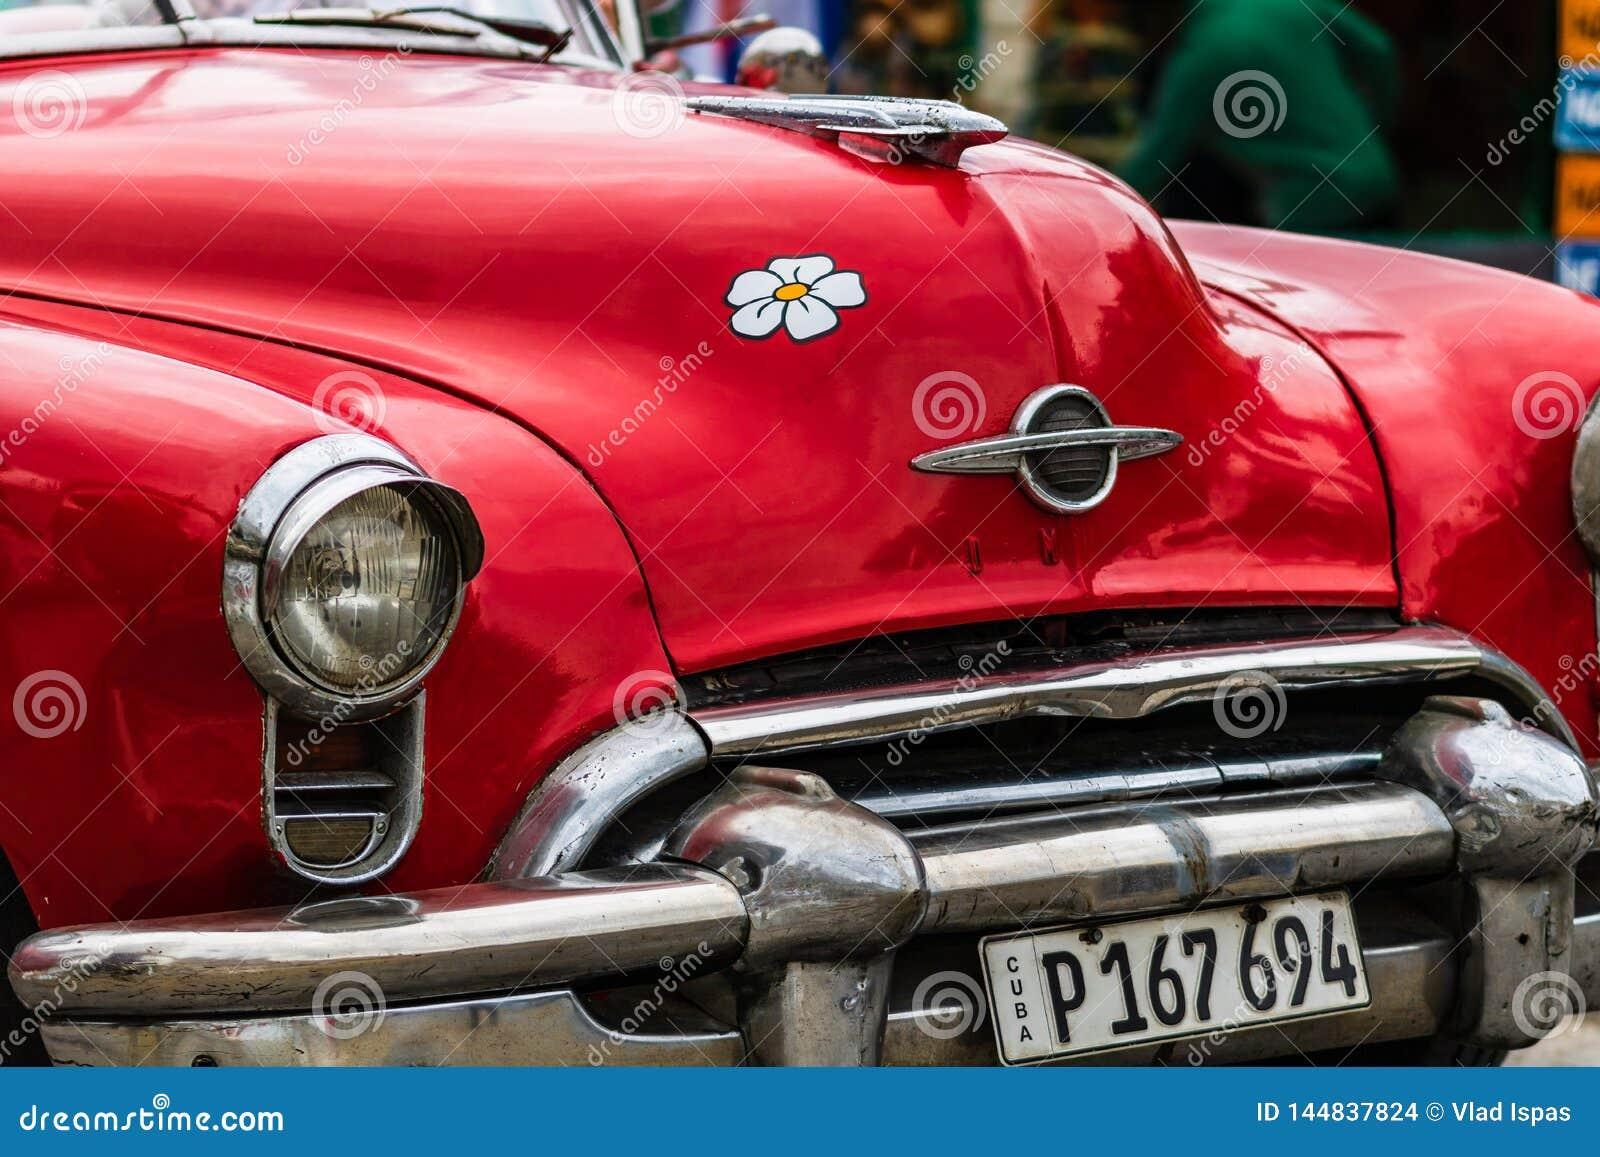 Sluit omhoog foto van rode klassieke Amerikaanse auto